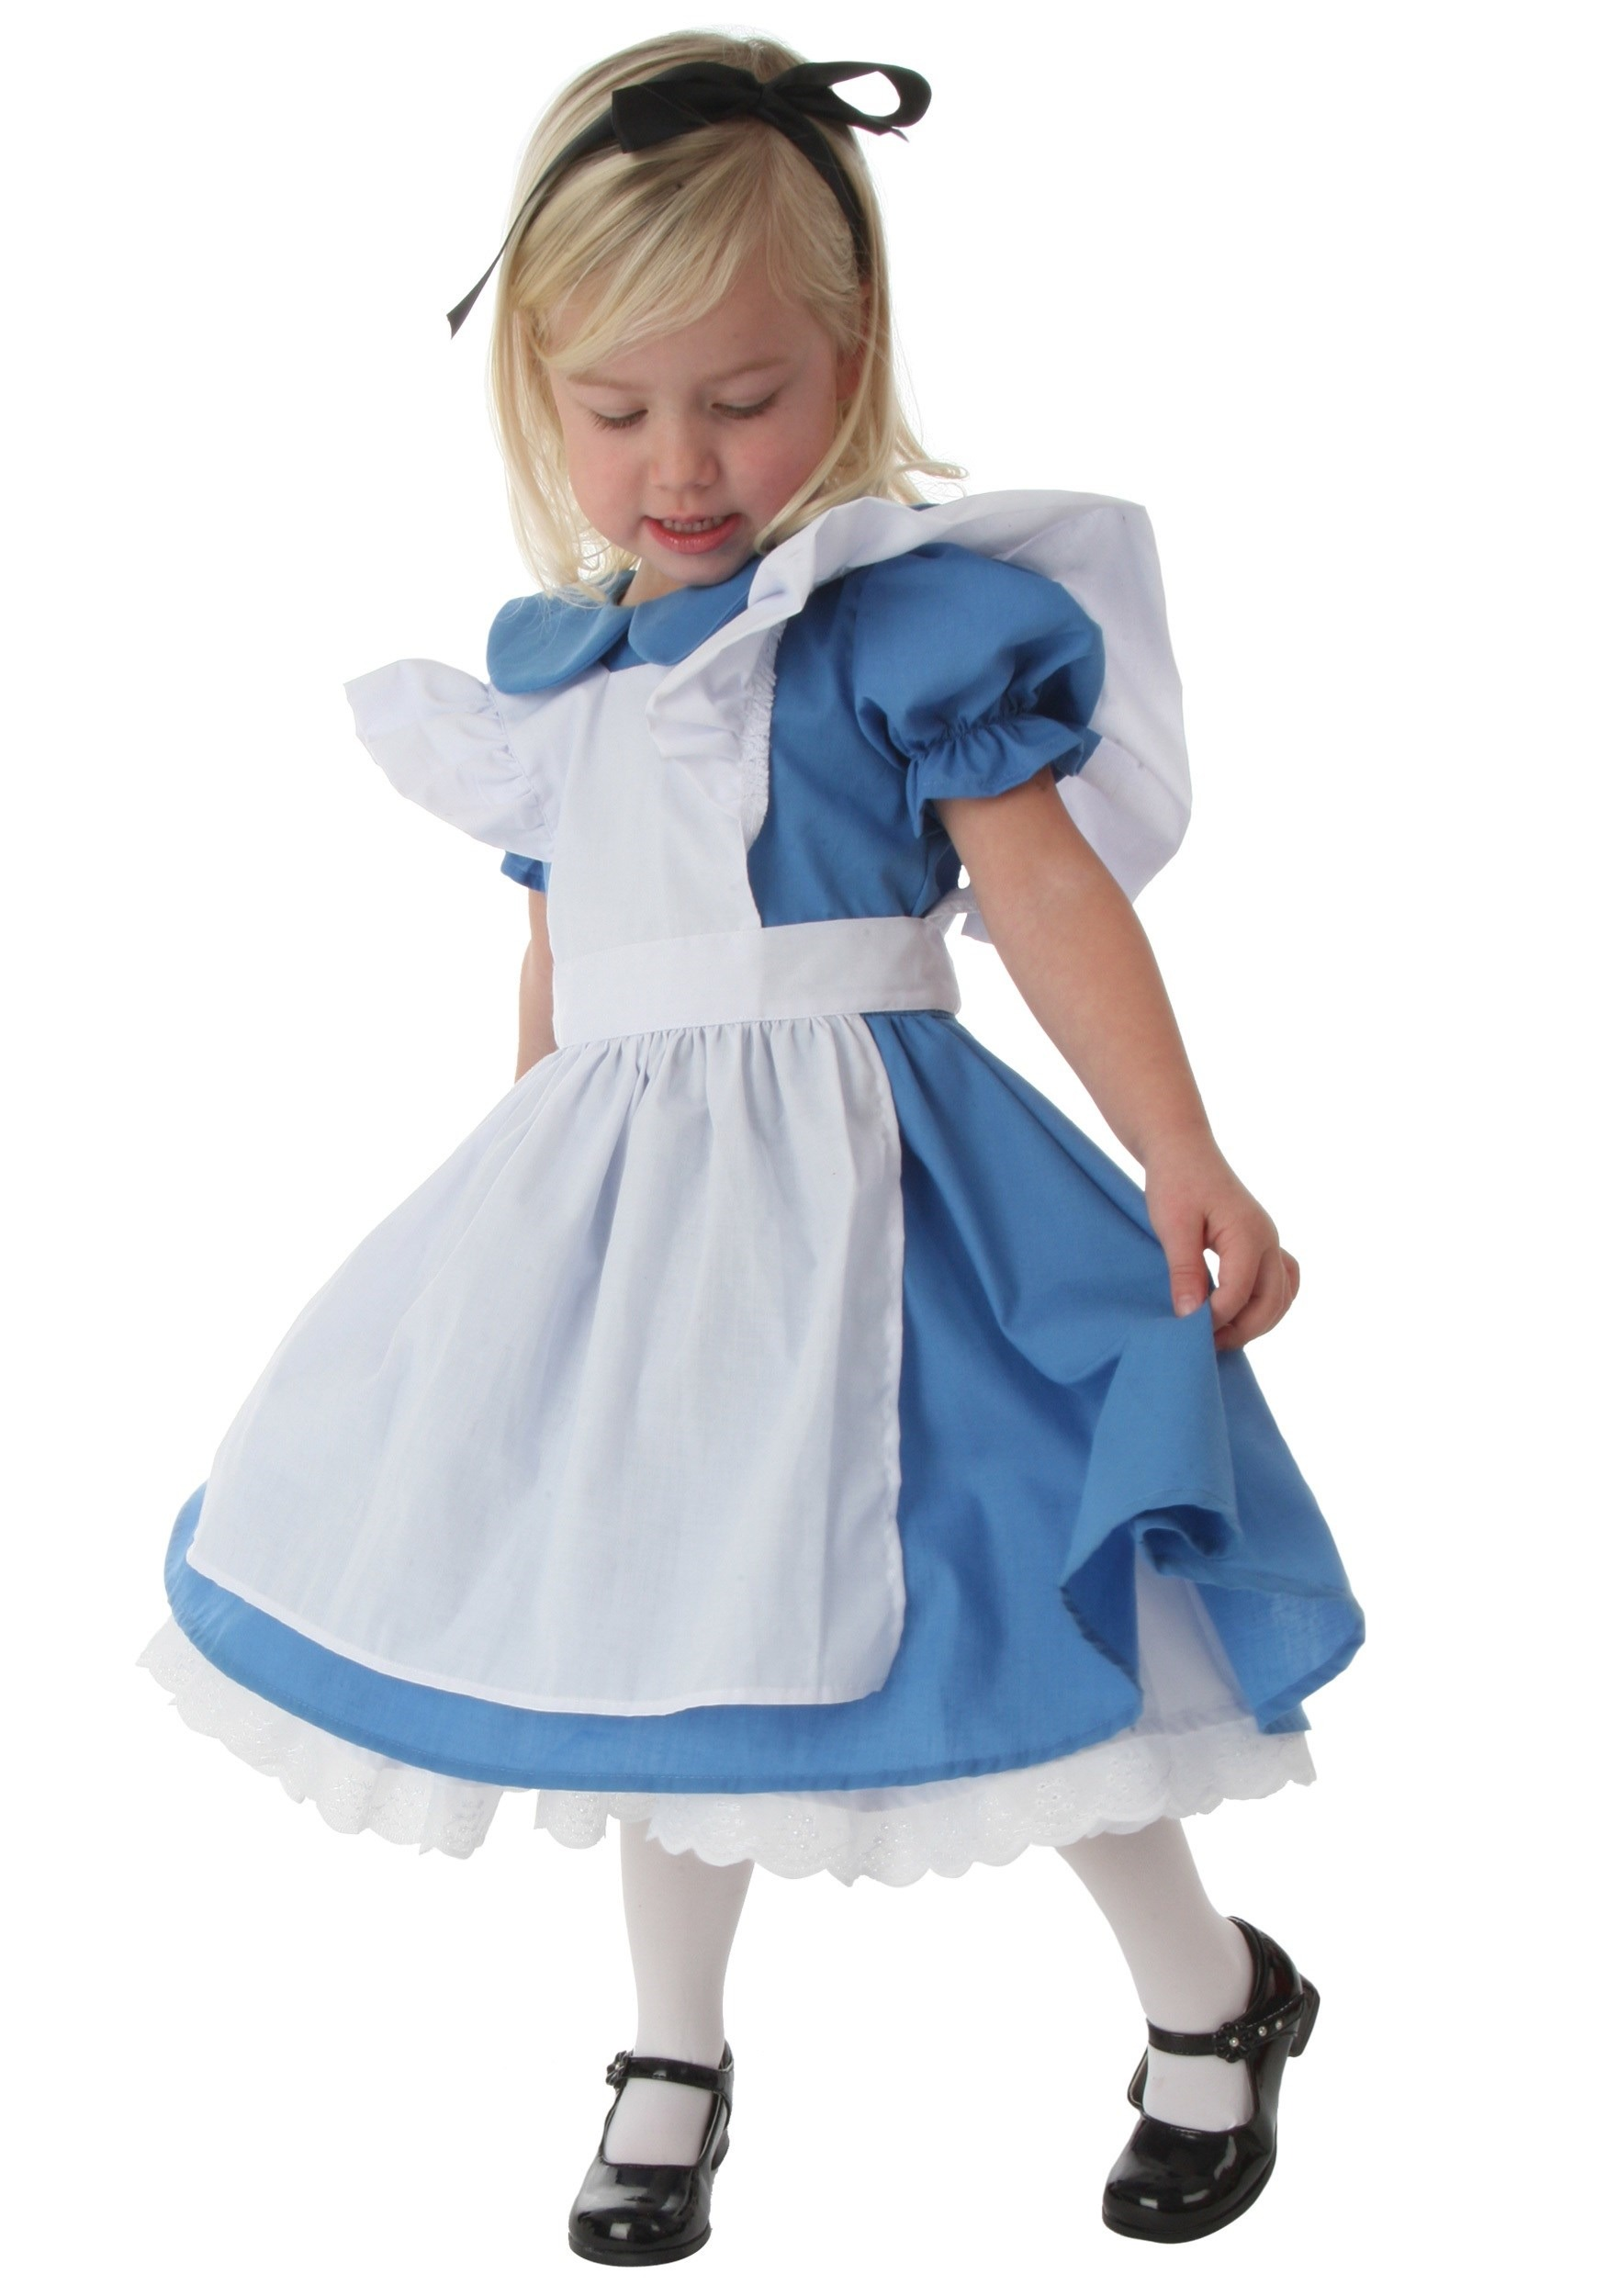 fd56ad9fffb0 Toddler Deluxe Alice Costume - Girls Alice in Wonderland Costumes